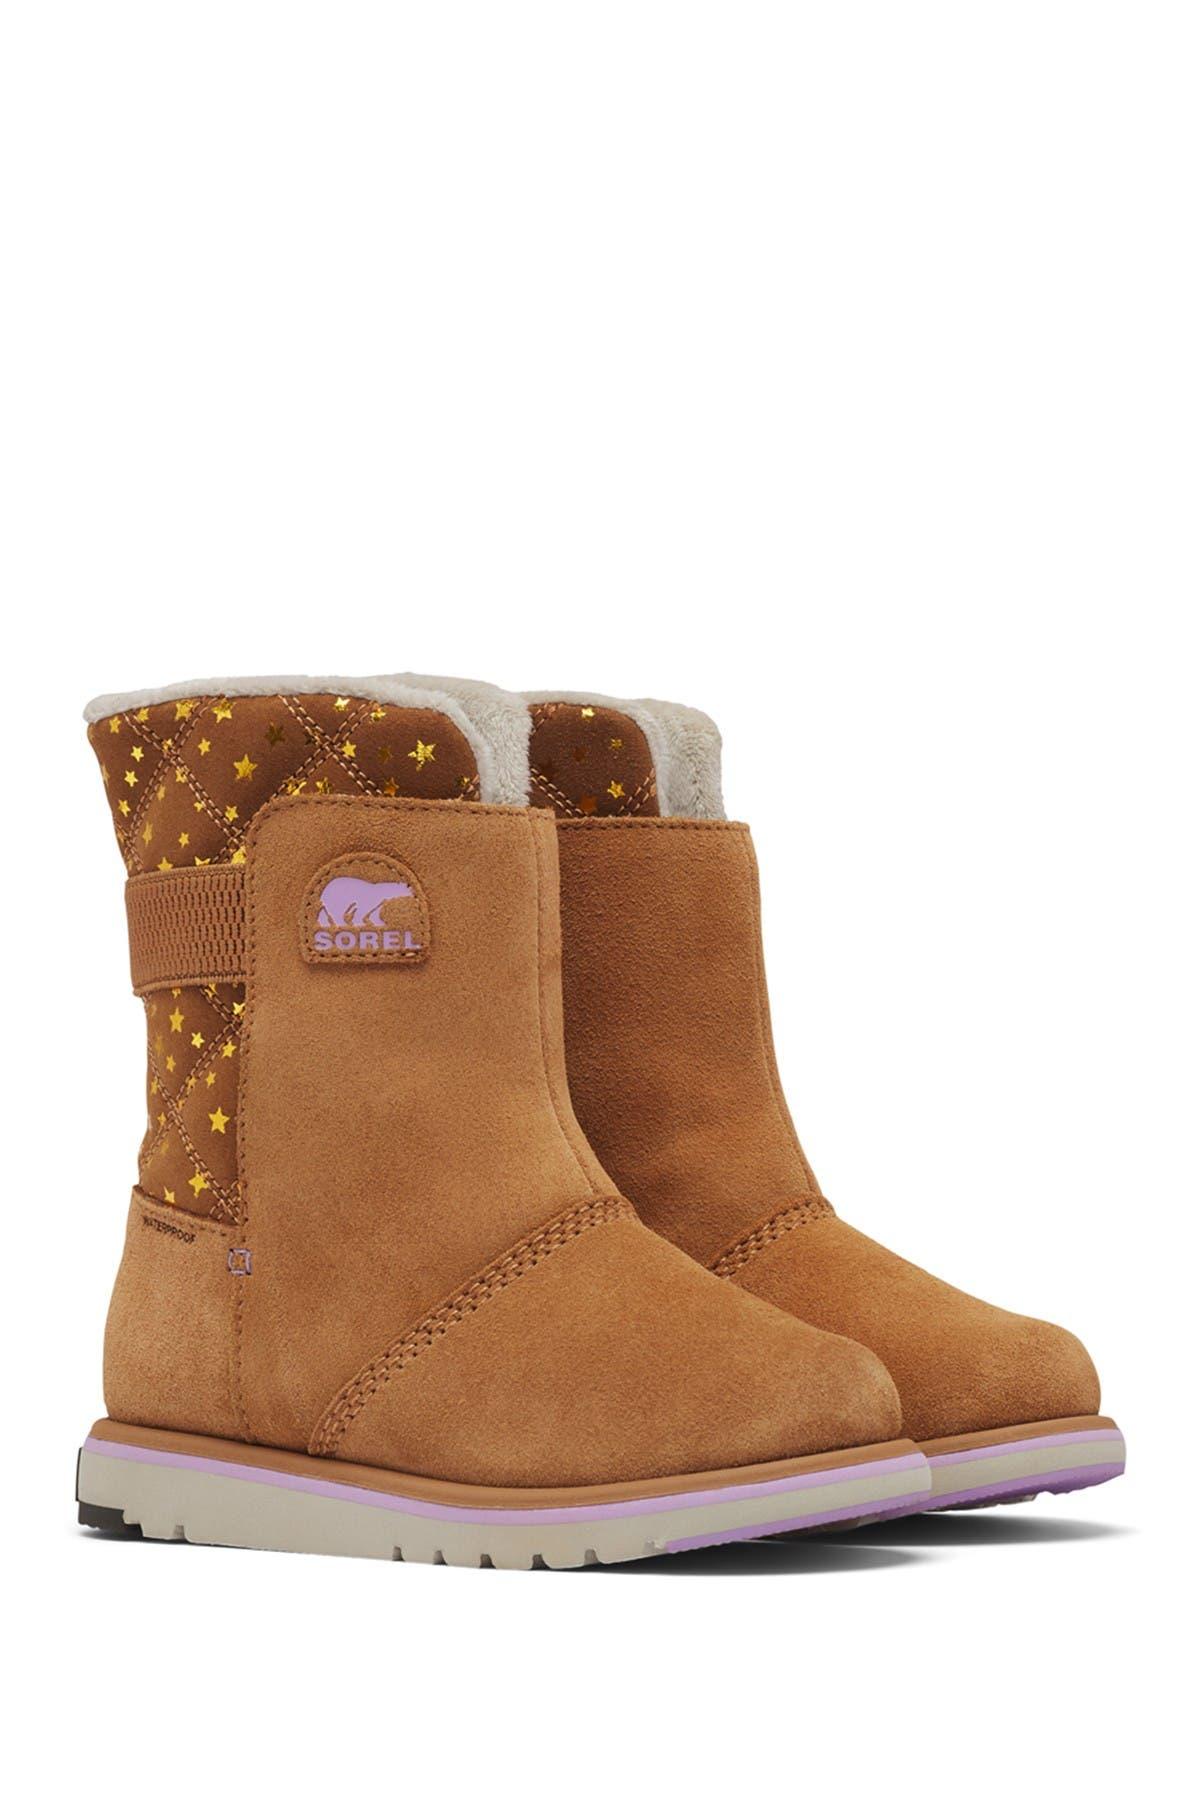 Image of Sorel Rylee Boot